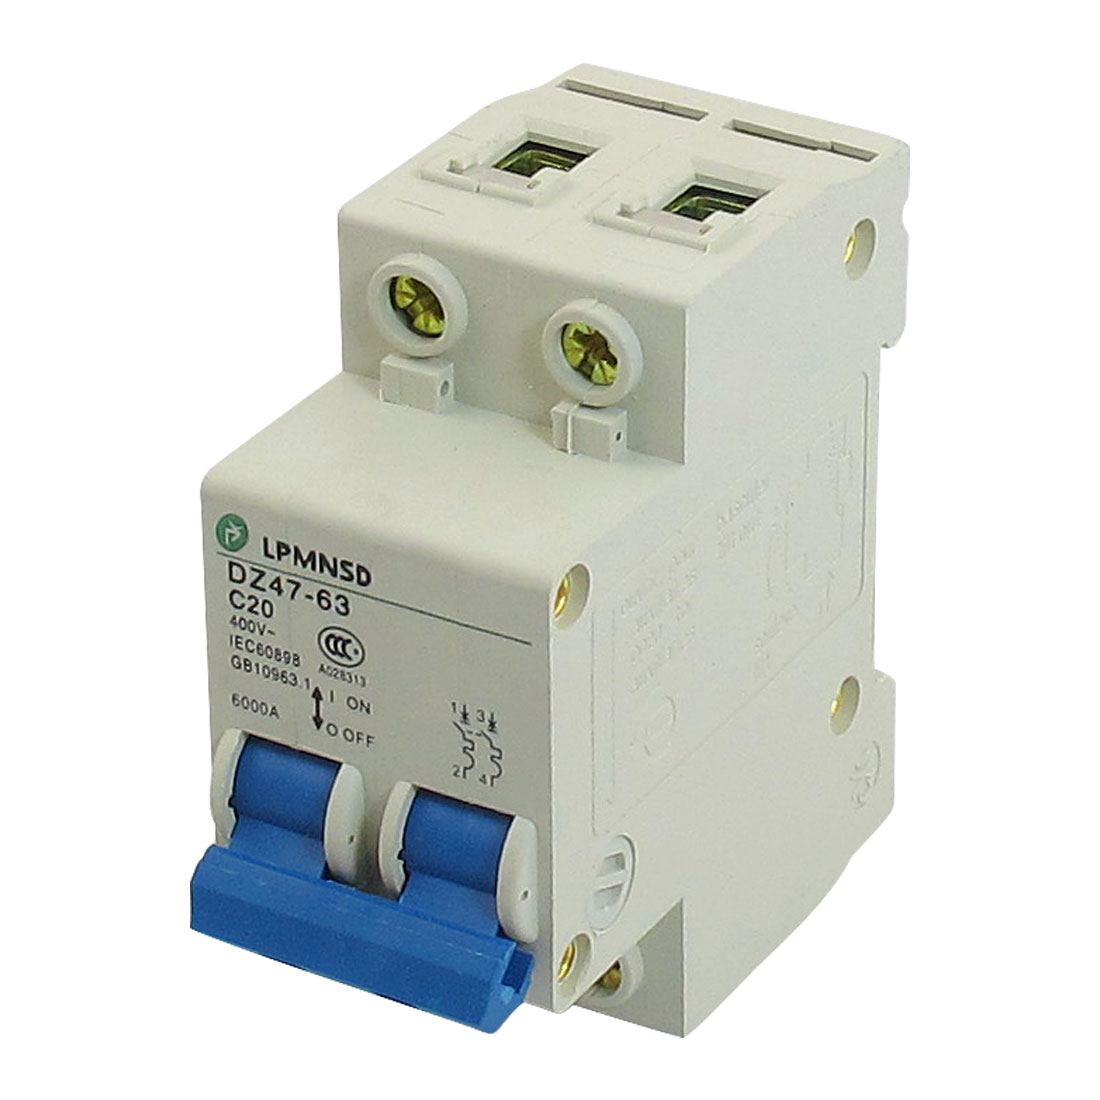 DZ47-63 C20 20A 400VAC 6000A Breaking Capacity 2 Poles Circuit Breaker